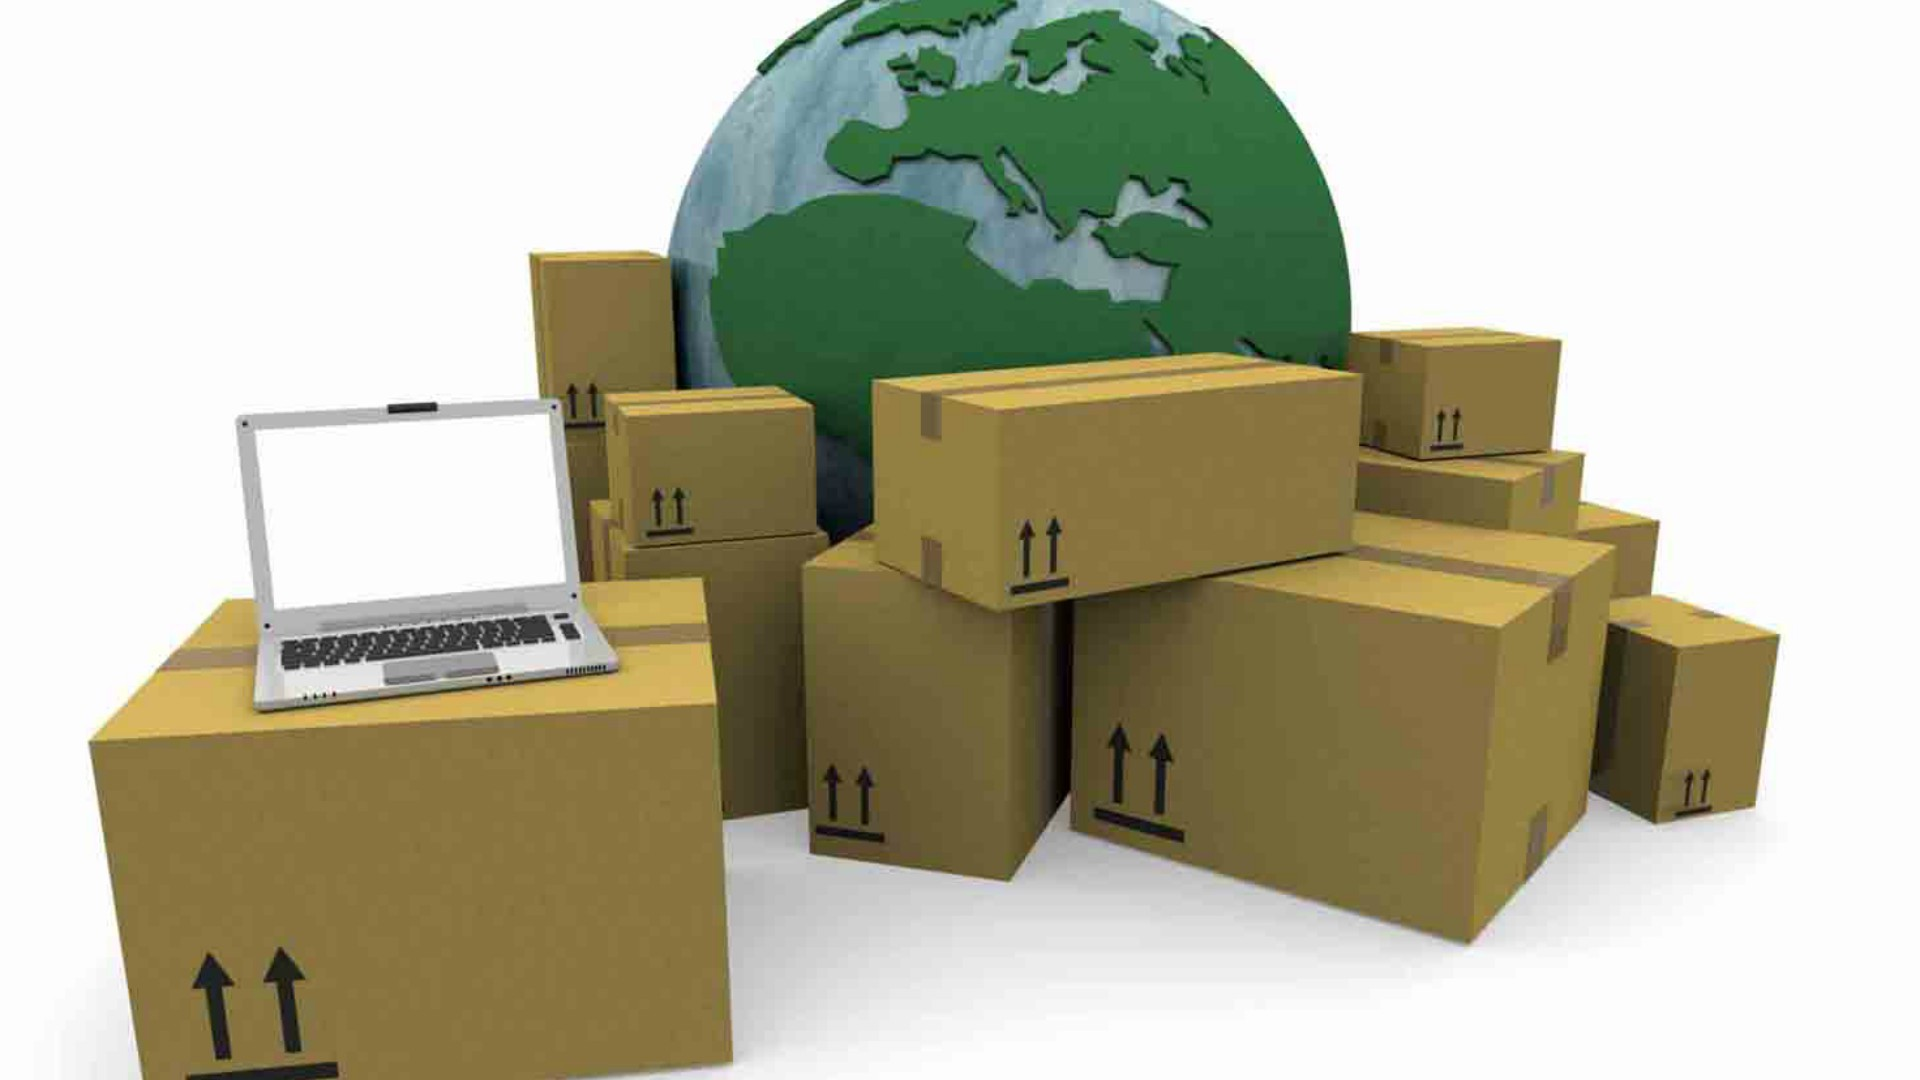 Empresas de paquetería